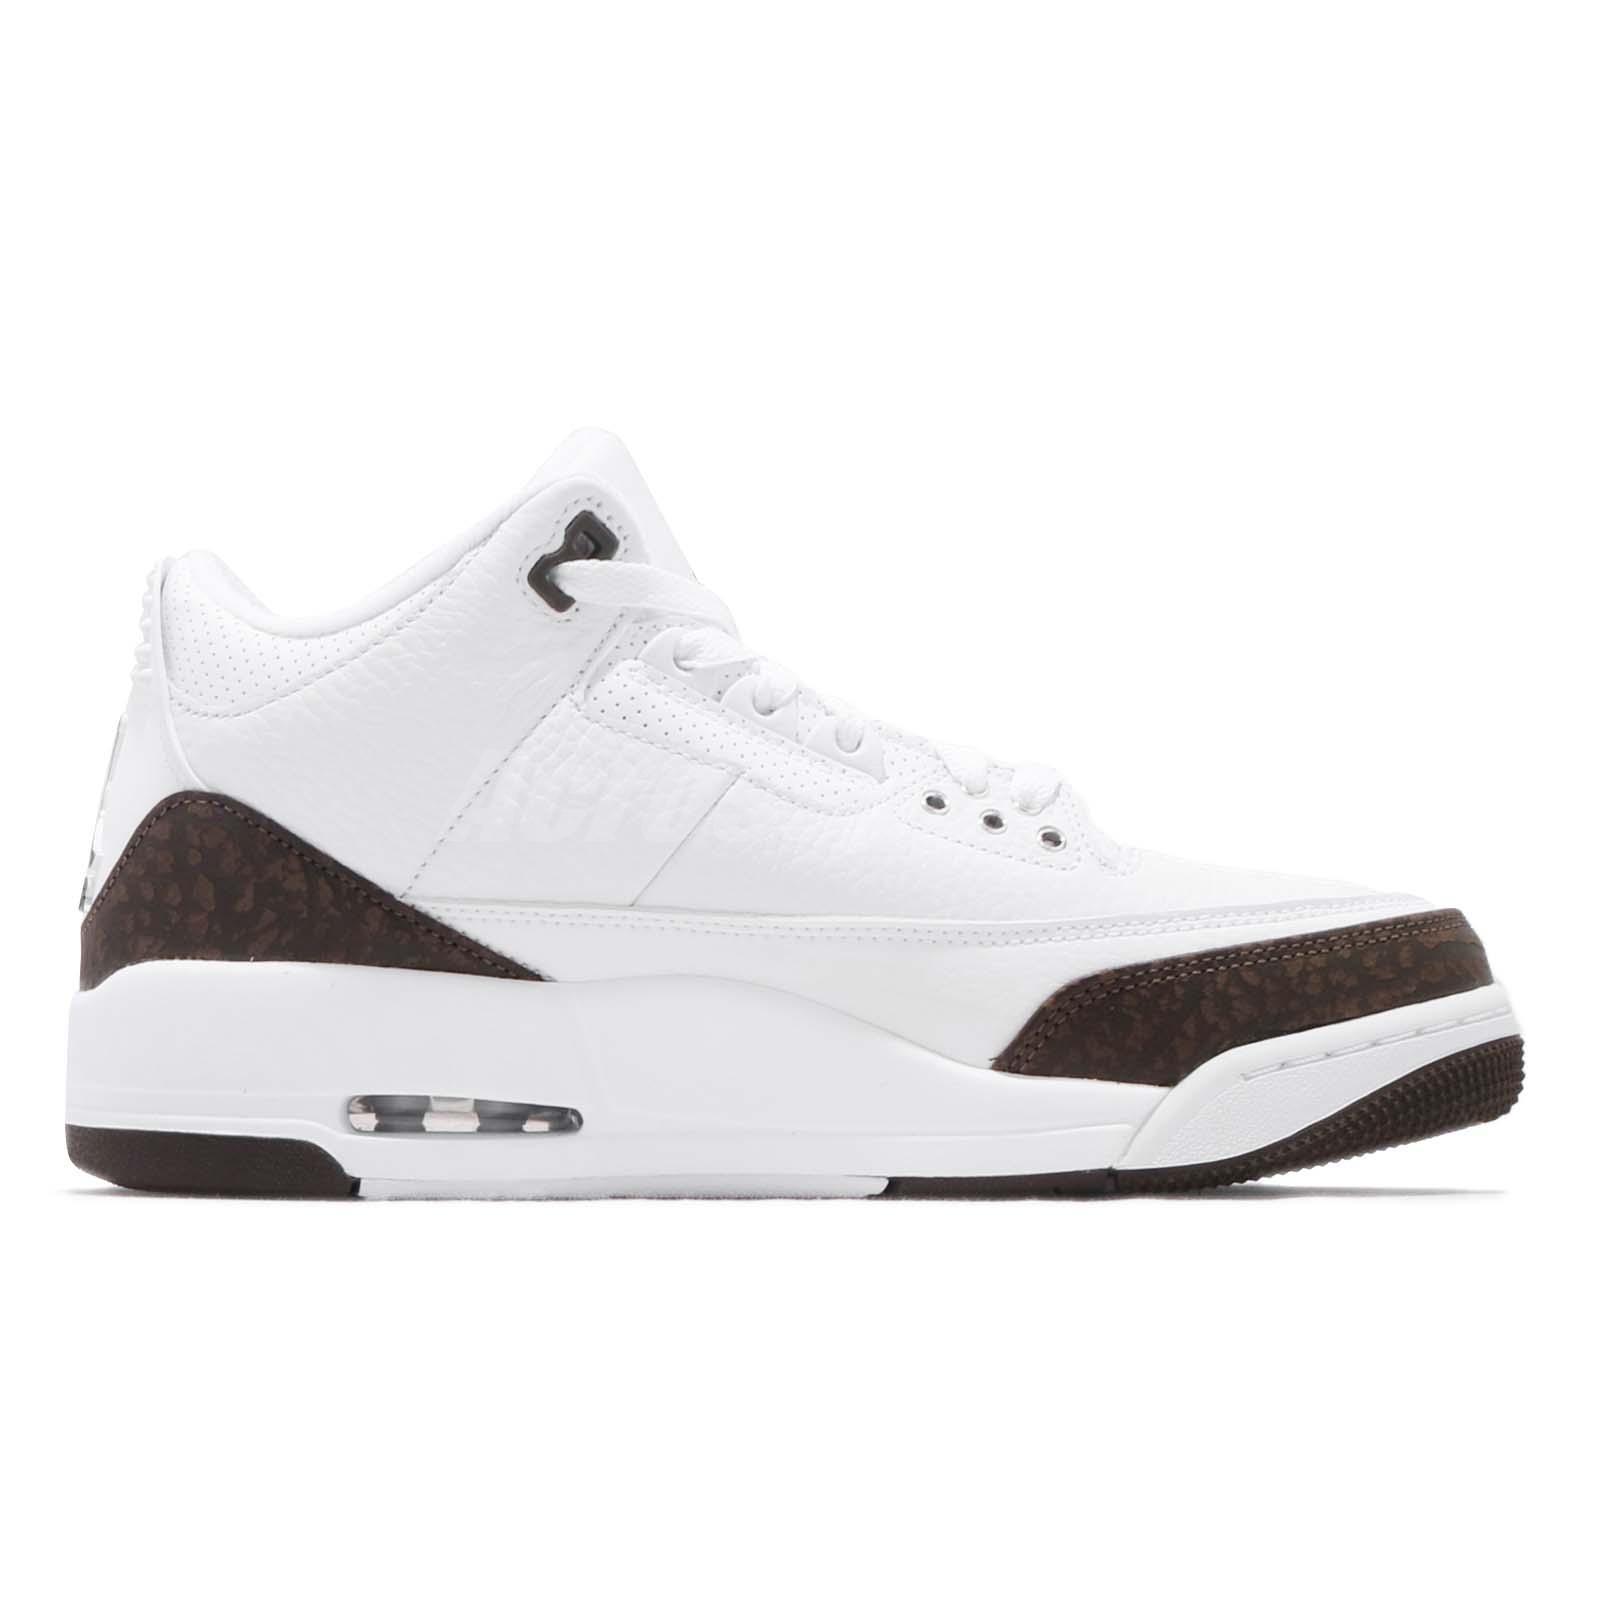 edfd8ea99f05 Nike Air Jordan 3 Retro Mocha 2018 III AJ3 White Men Basketball ...